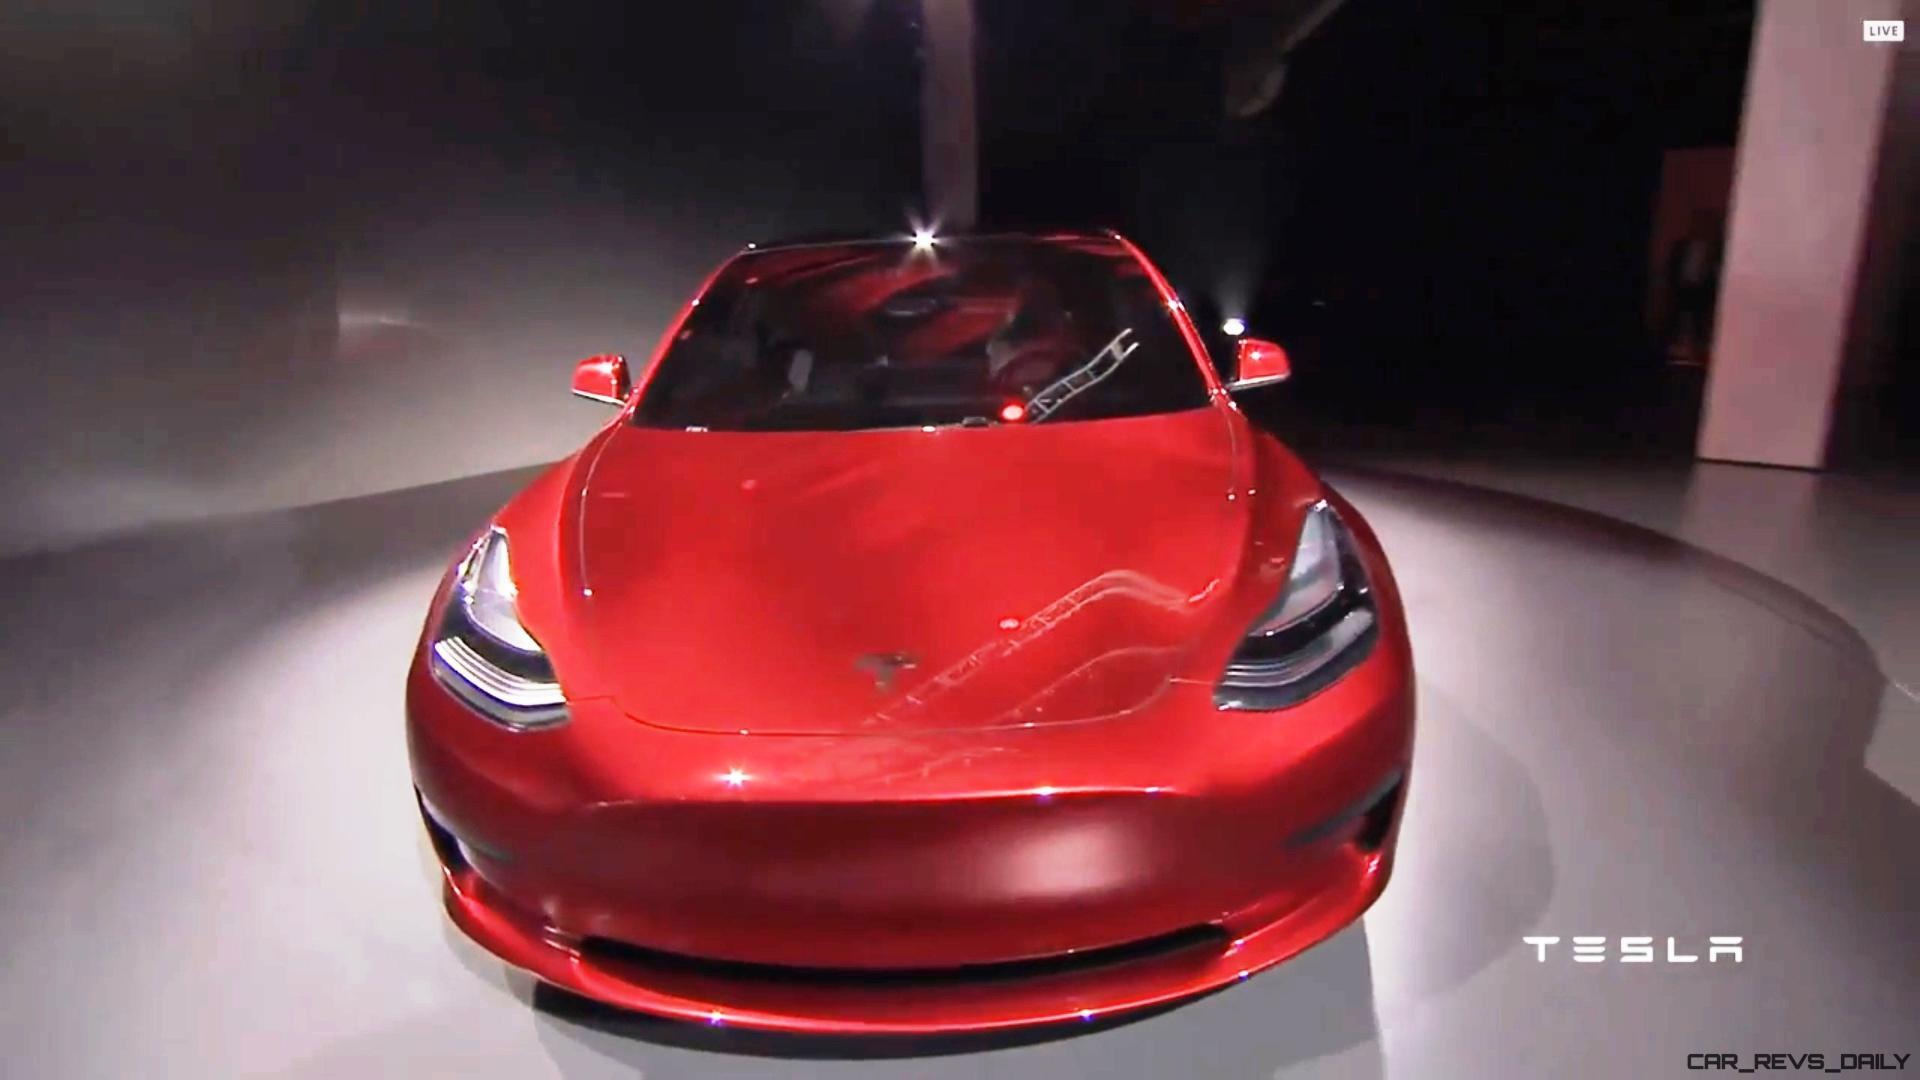 2018 TESLA Model 3 - Design Analysis, 50 Images and ...